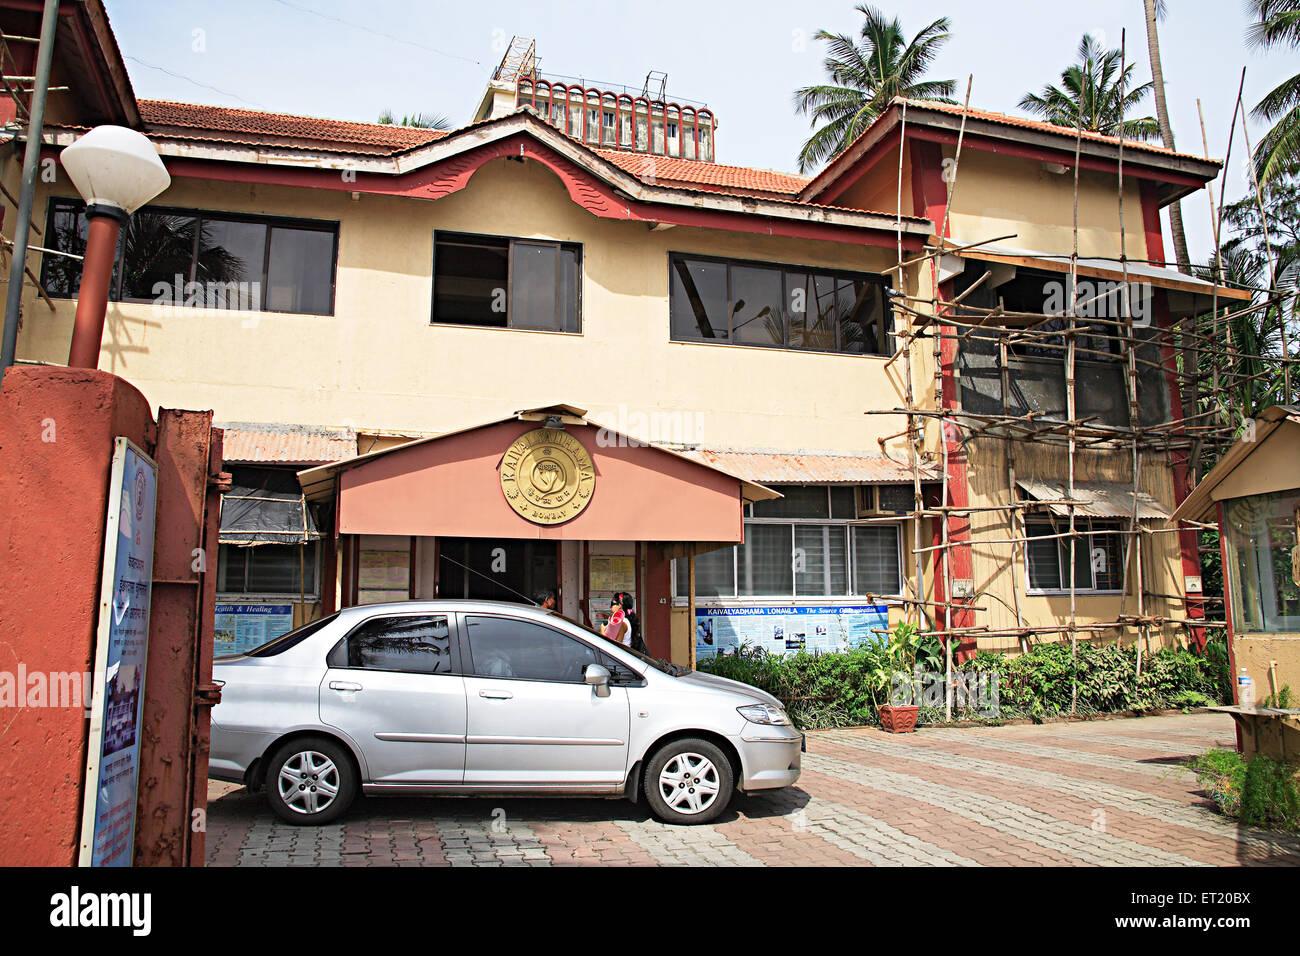 Kaivalya Dhama Yogic centre ; Netaji Subhash Chandra Bose road ; Charni road ; Bombay Mumbai ; Maharashtra ; India - Stock Image